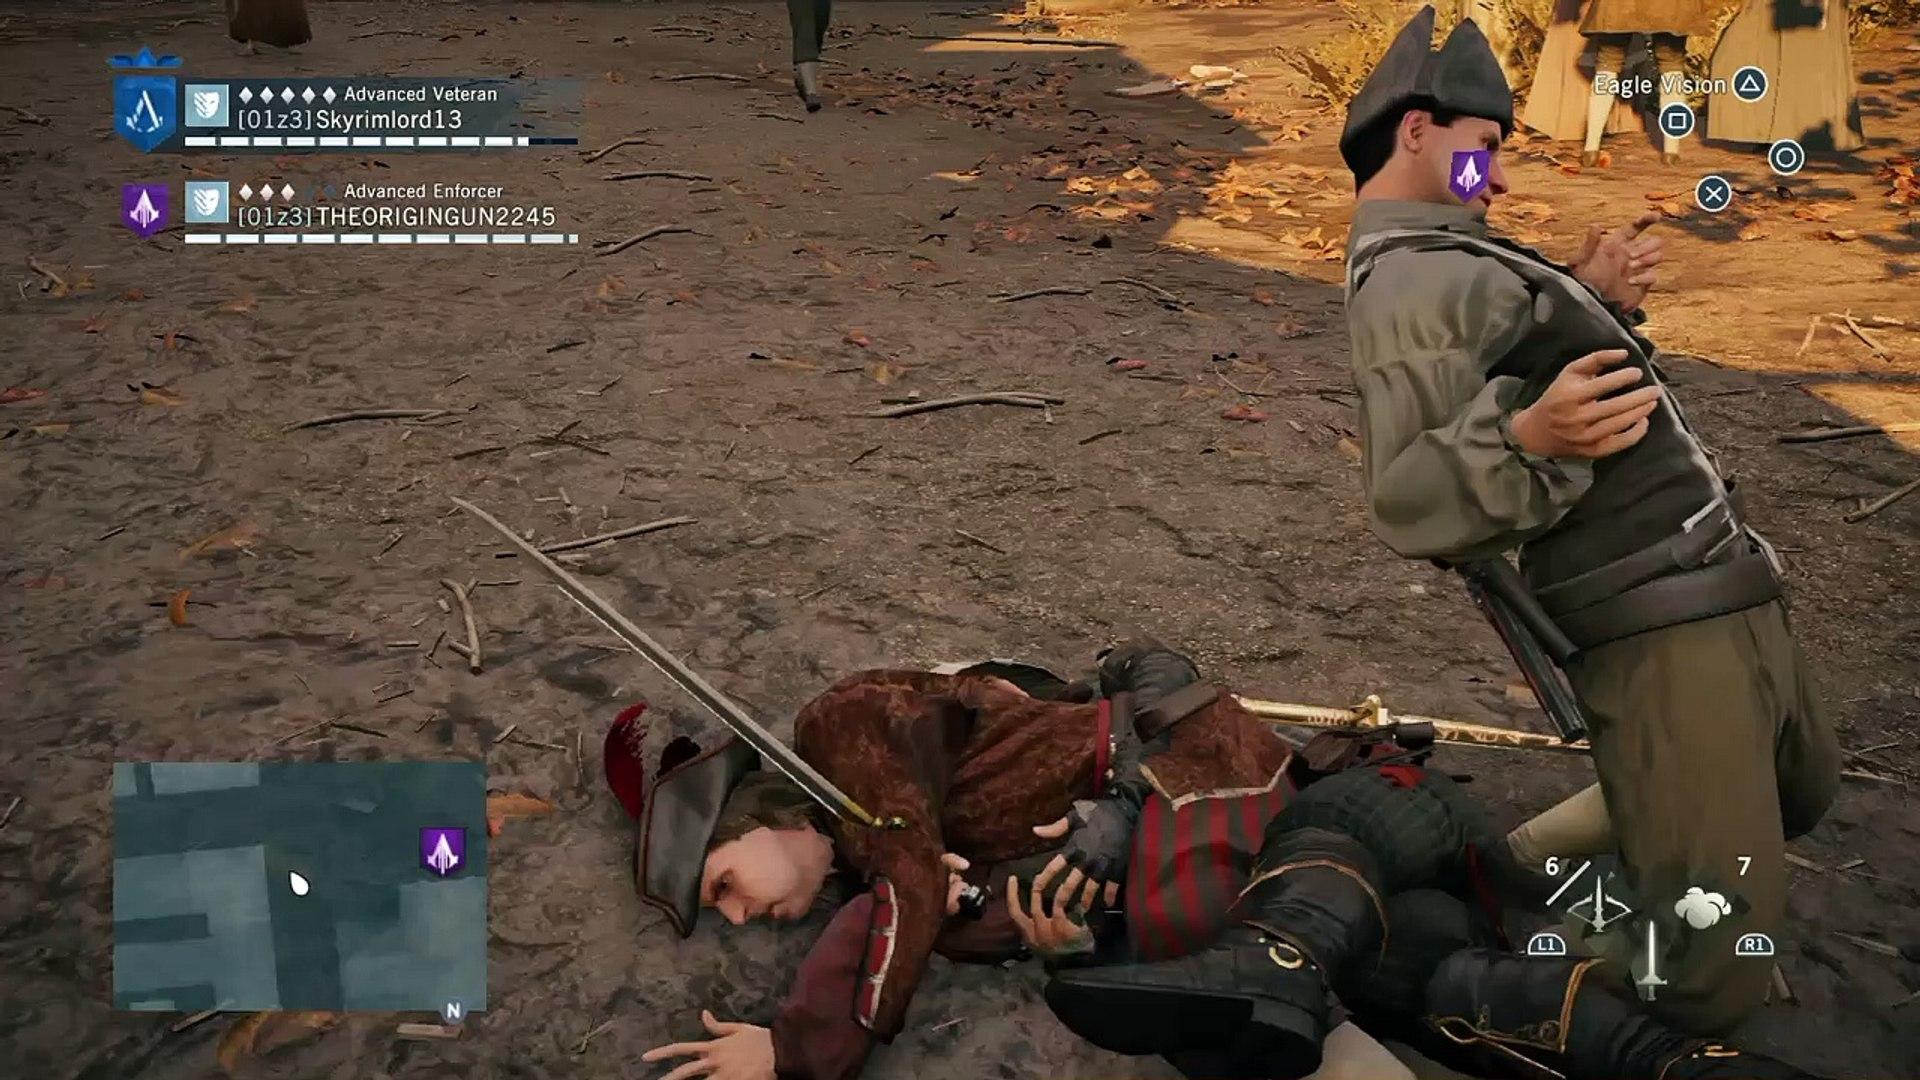 Funny body glitches in Assassin's Creed Unity